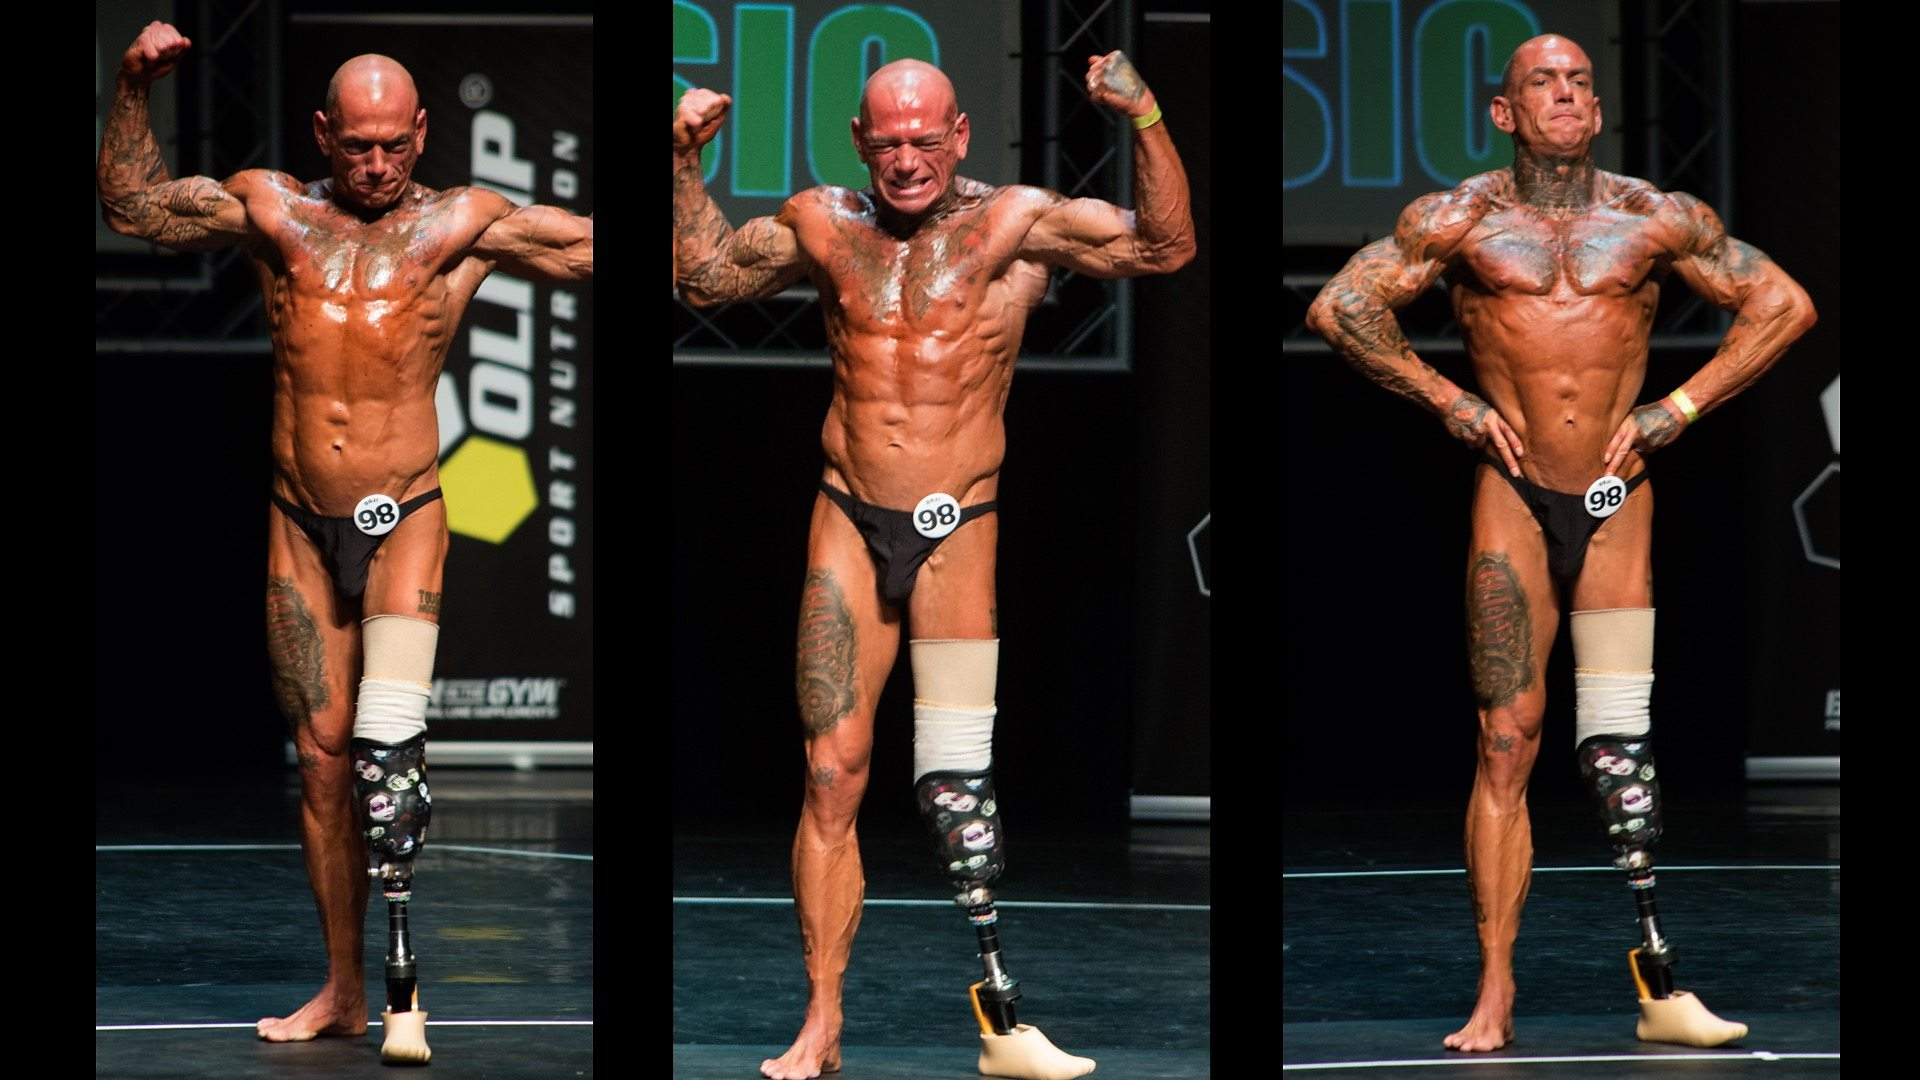 vegan bodybuilding protein: What A Mistake!